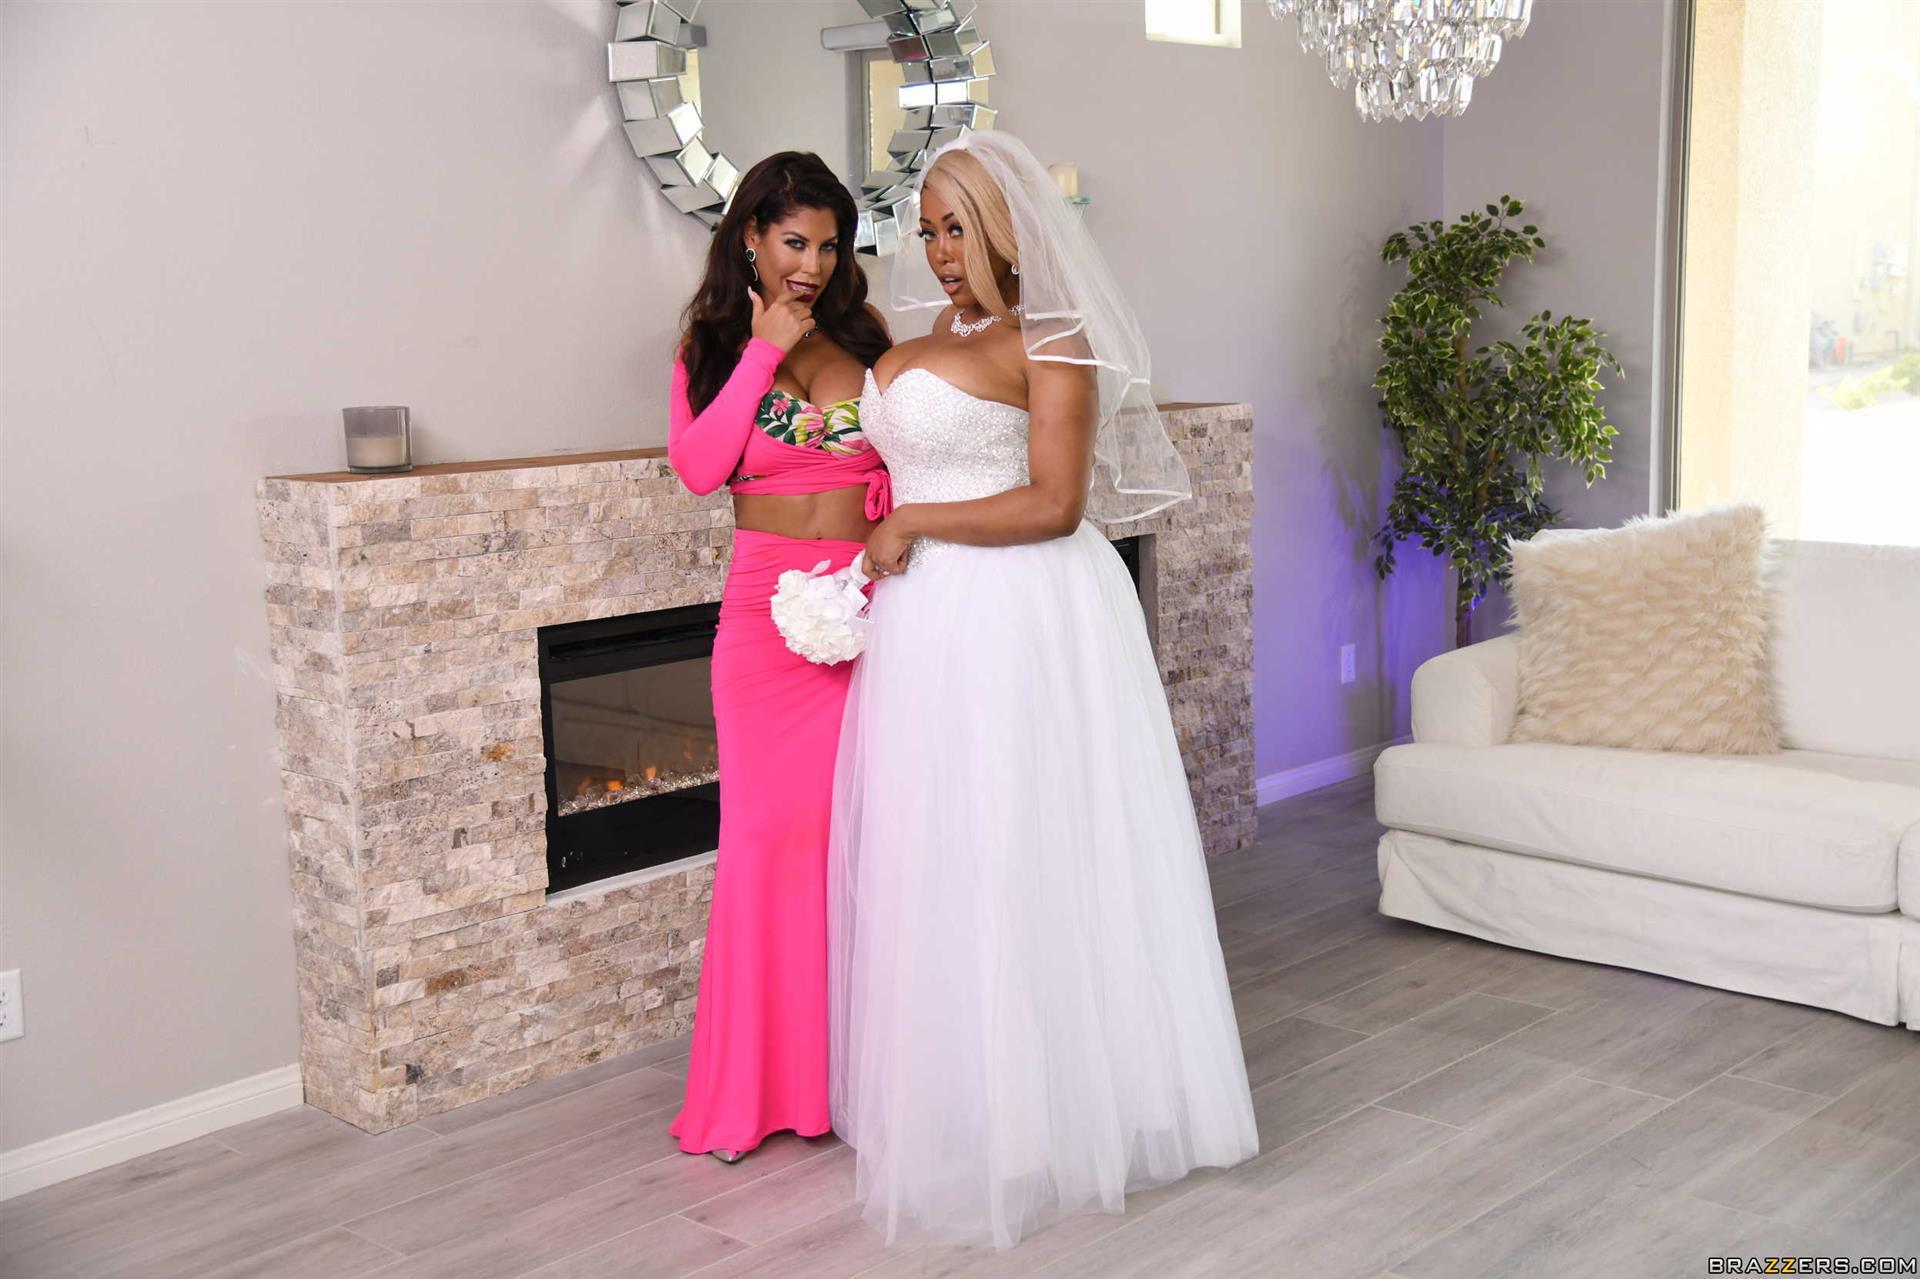 BRIDGETTE B MORIAH MILLS MORIAHS WEDDING SHOWER